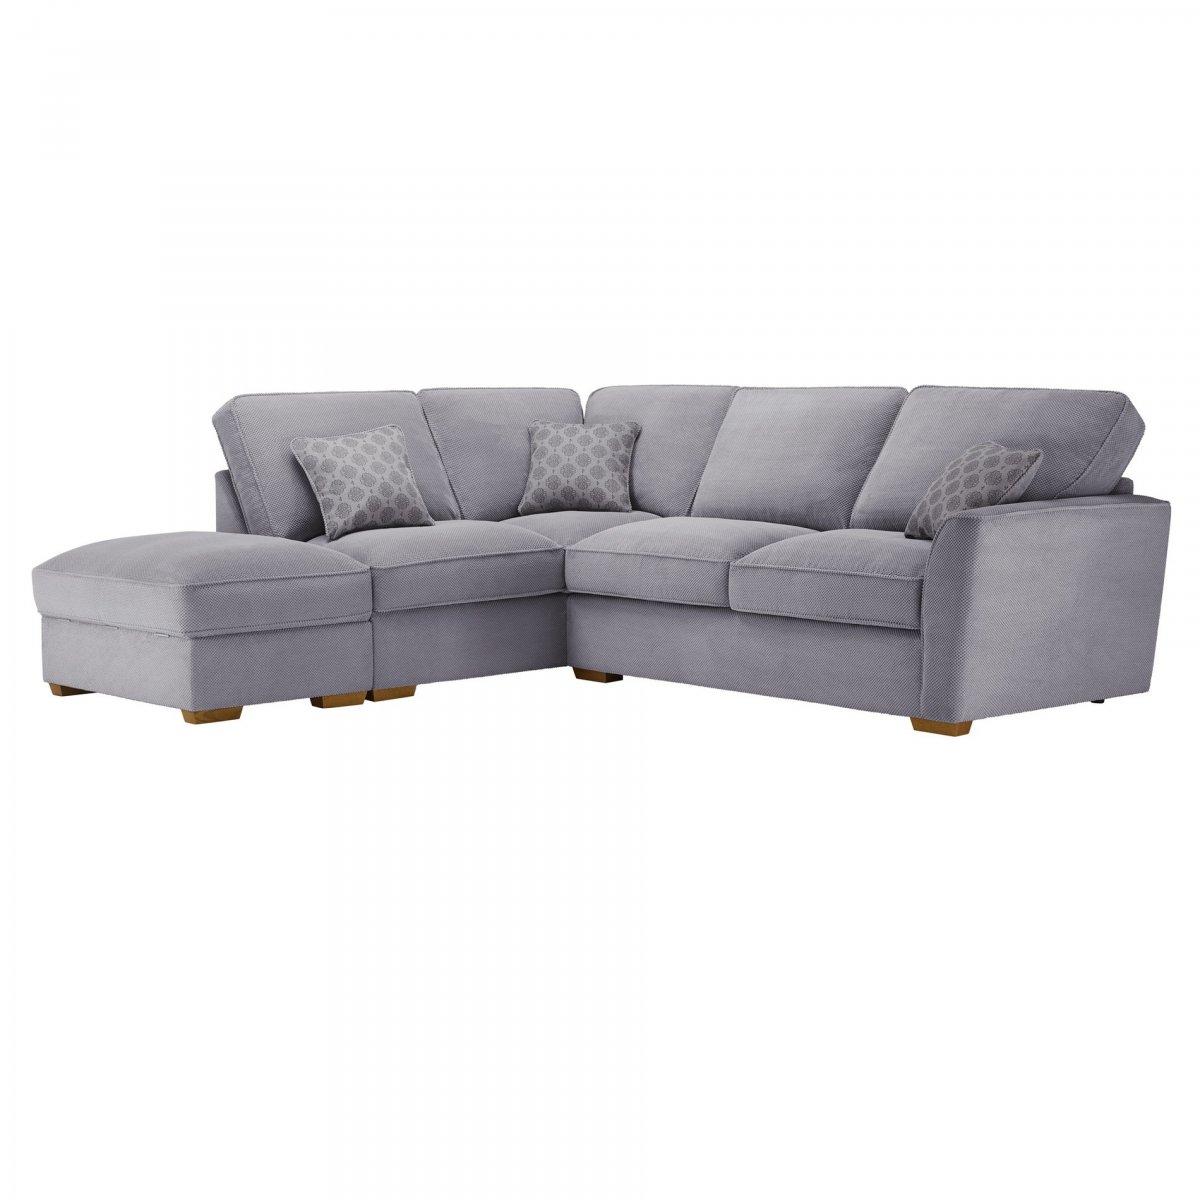 Nebraska Right Hand Corner Sofa With High Back In Aero Silver